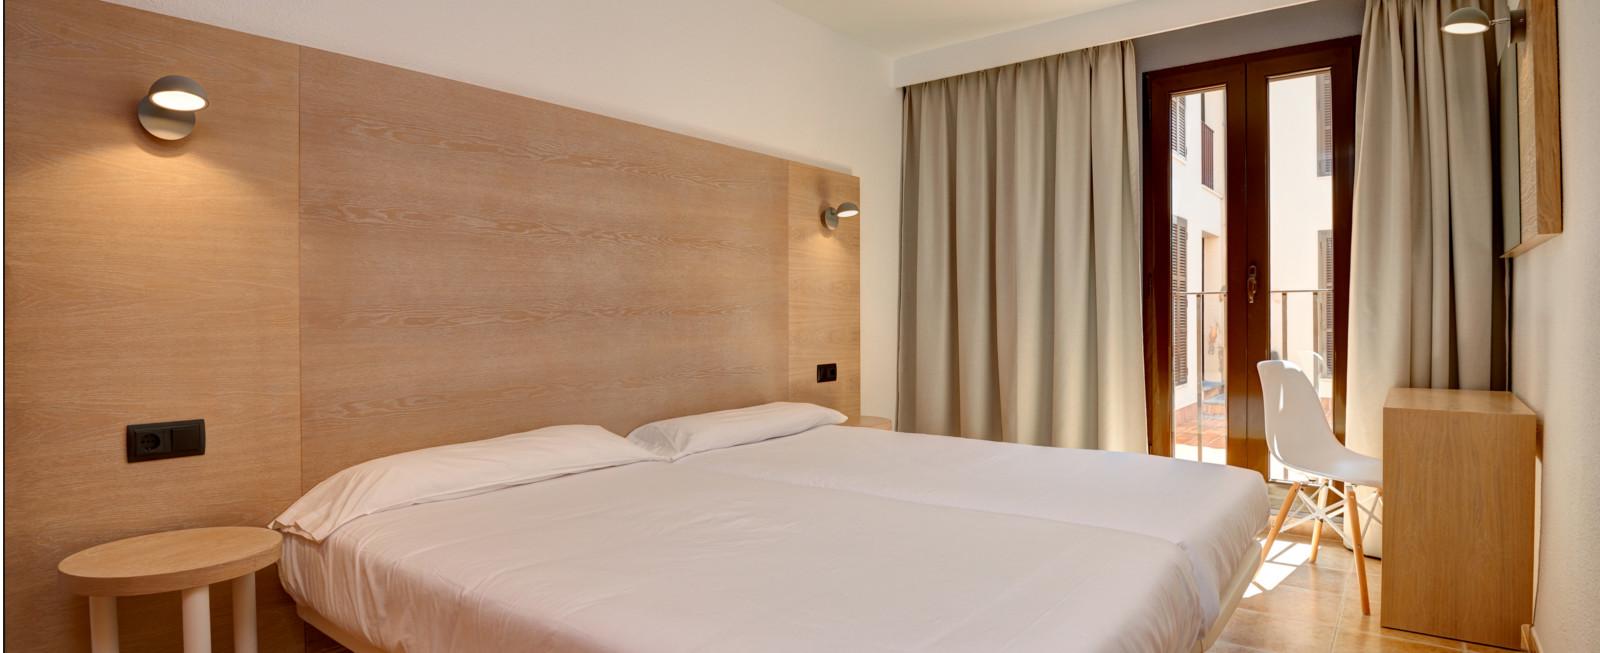 Zimmer Protur Floriana Resort Aparthotel Cala Bona, Mallorca ...